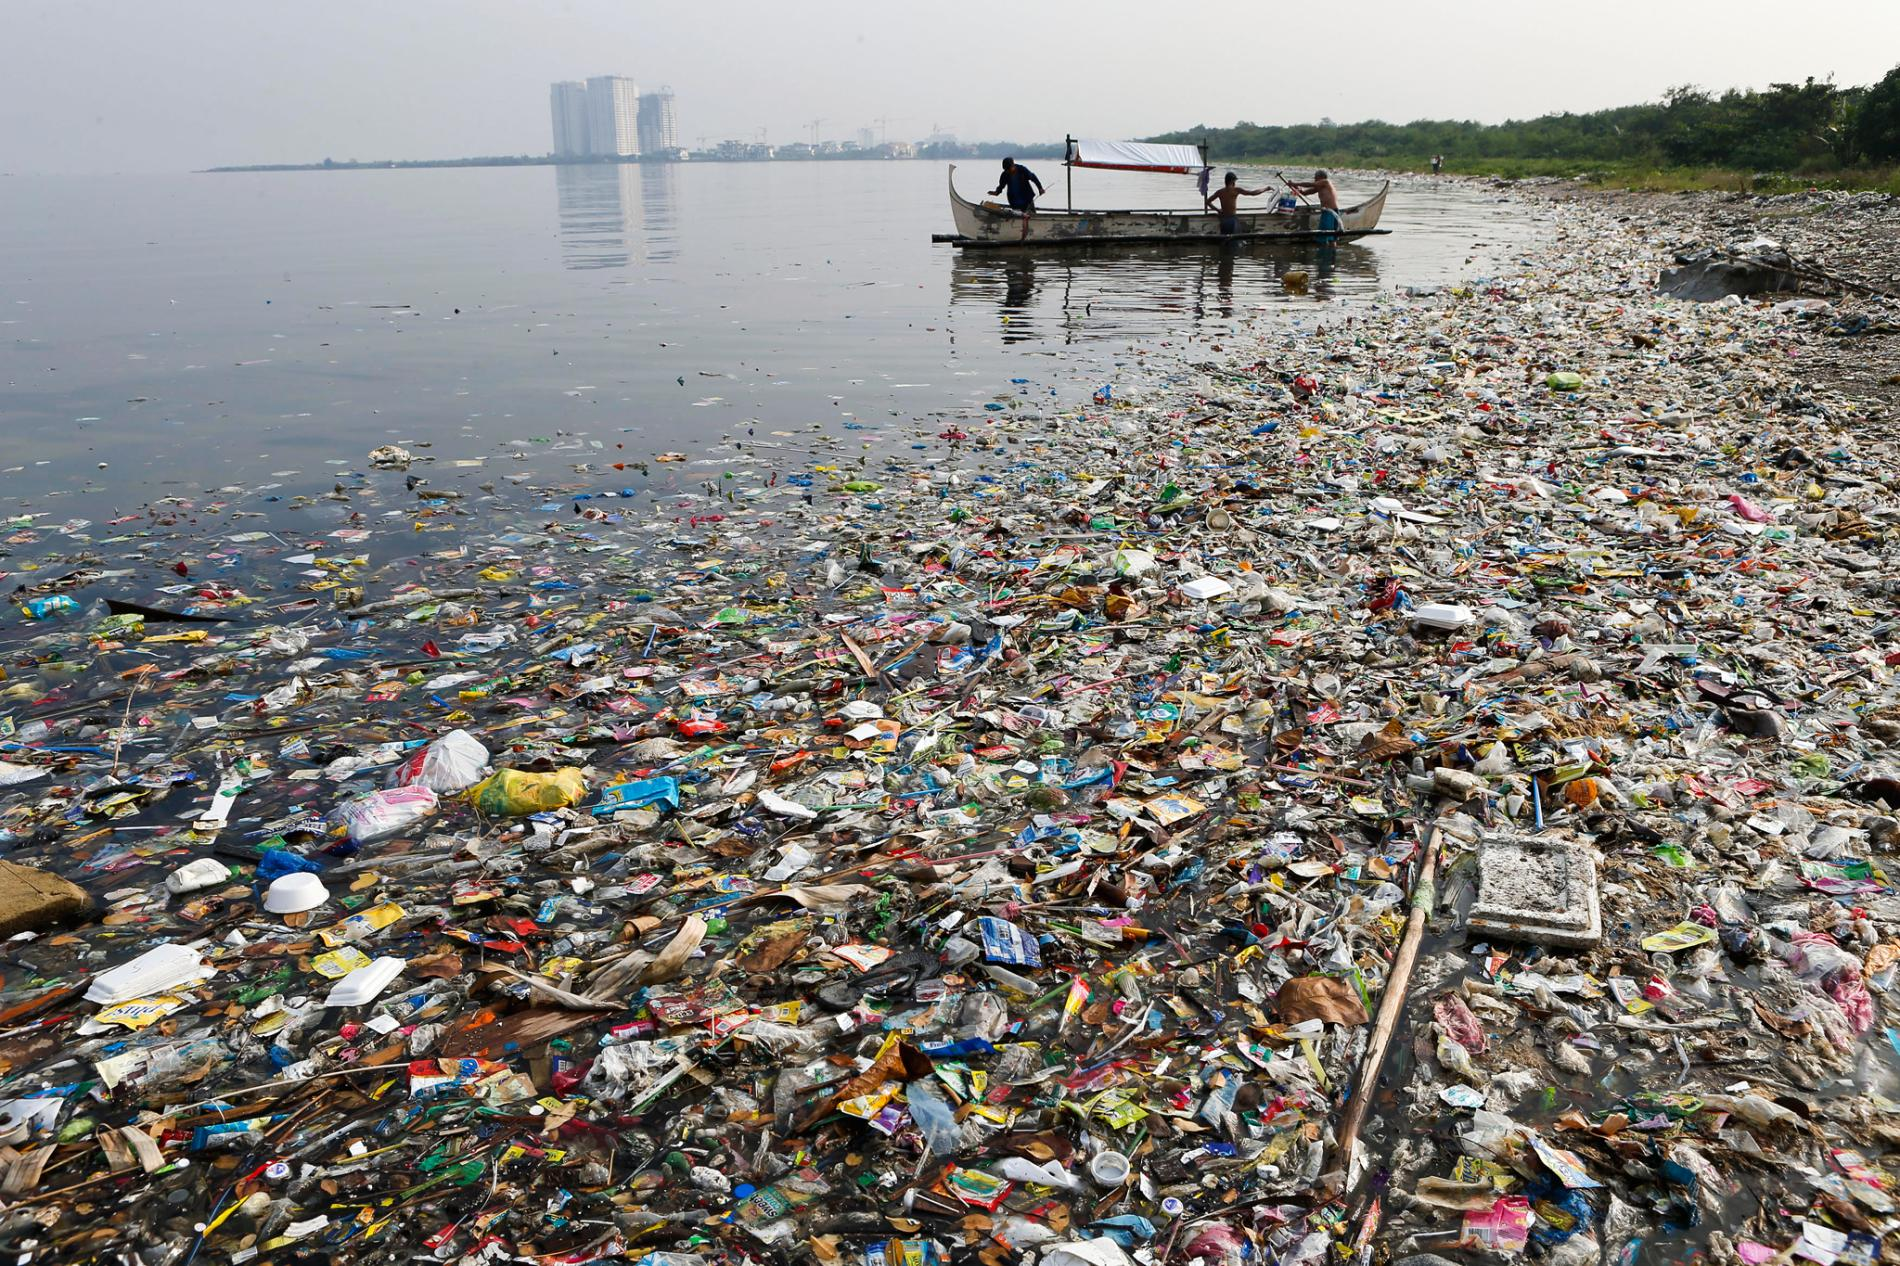 15 Shocking Facts About Ocean Pollution - Passport Ocean